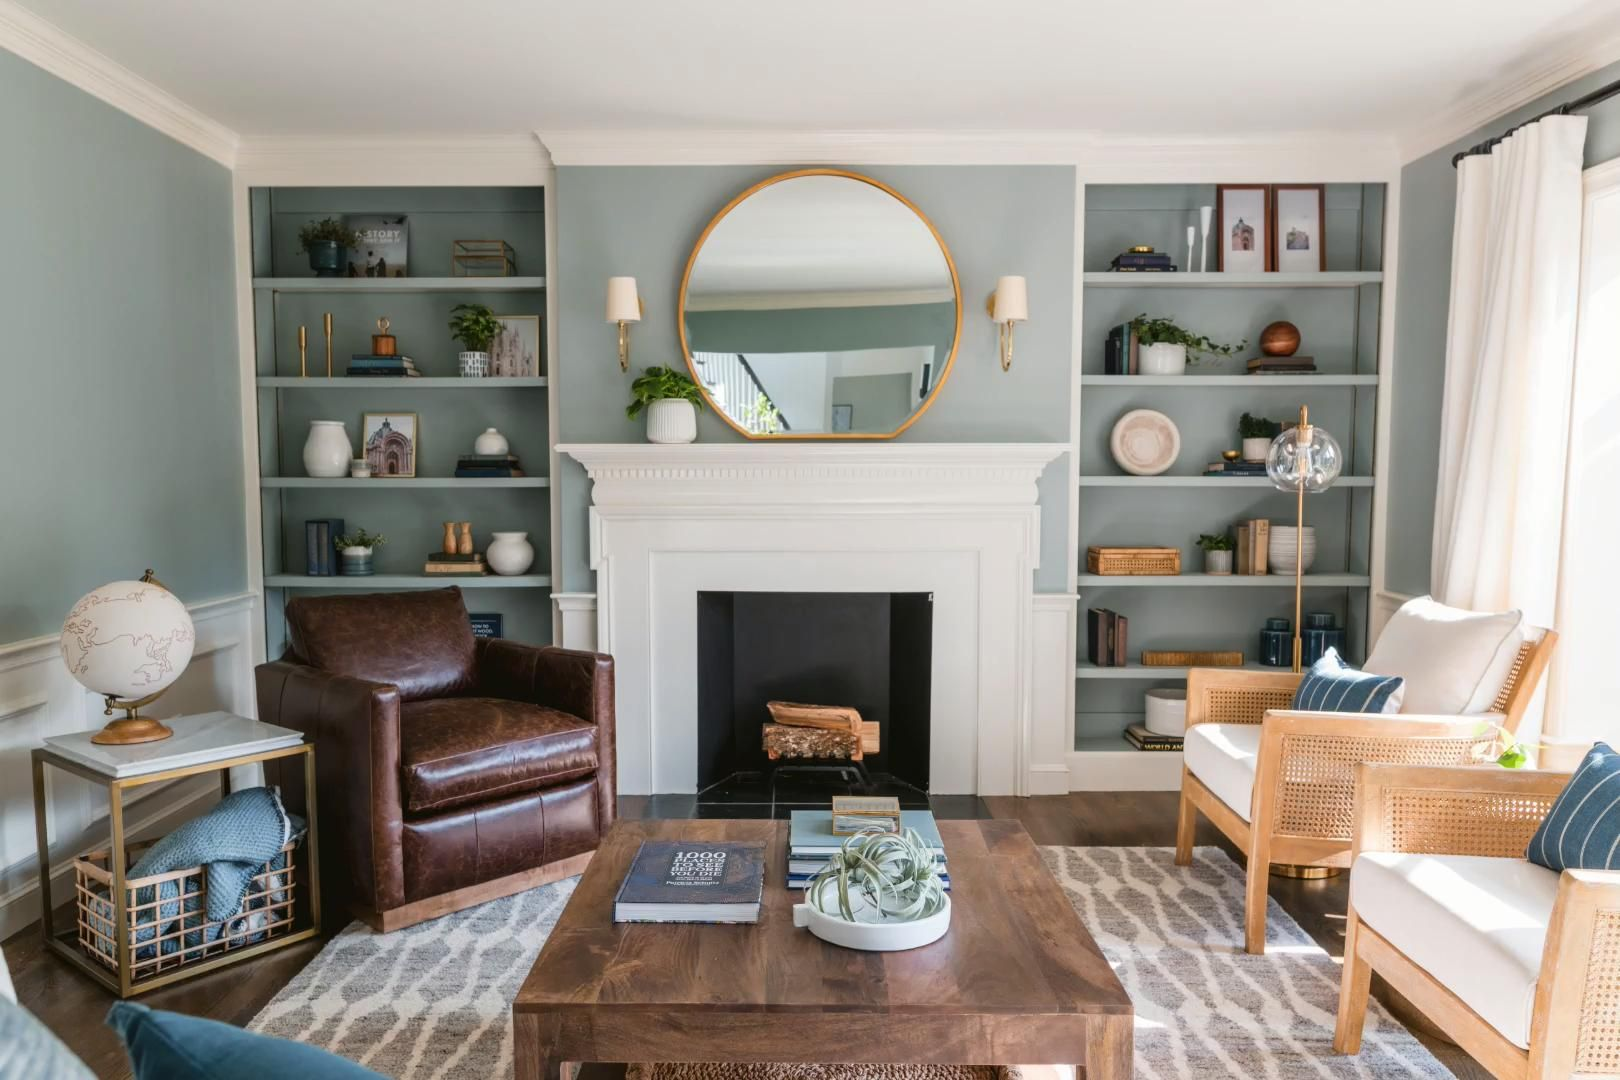 Gray Oak Studio - Boston based interior design studio creating approachable, gorgeous spaces